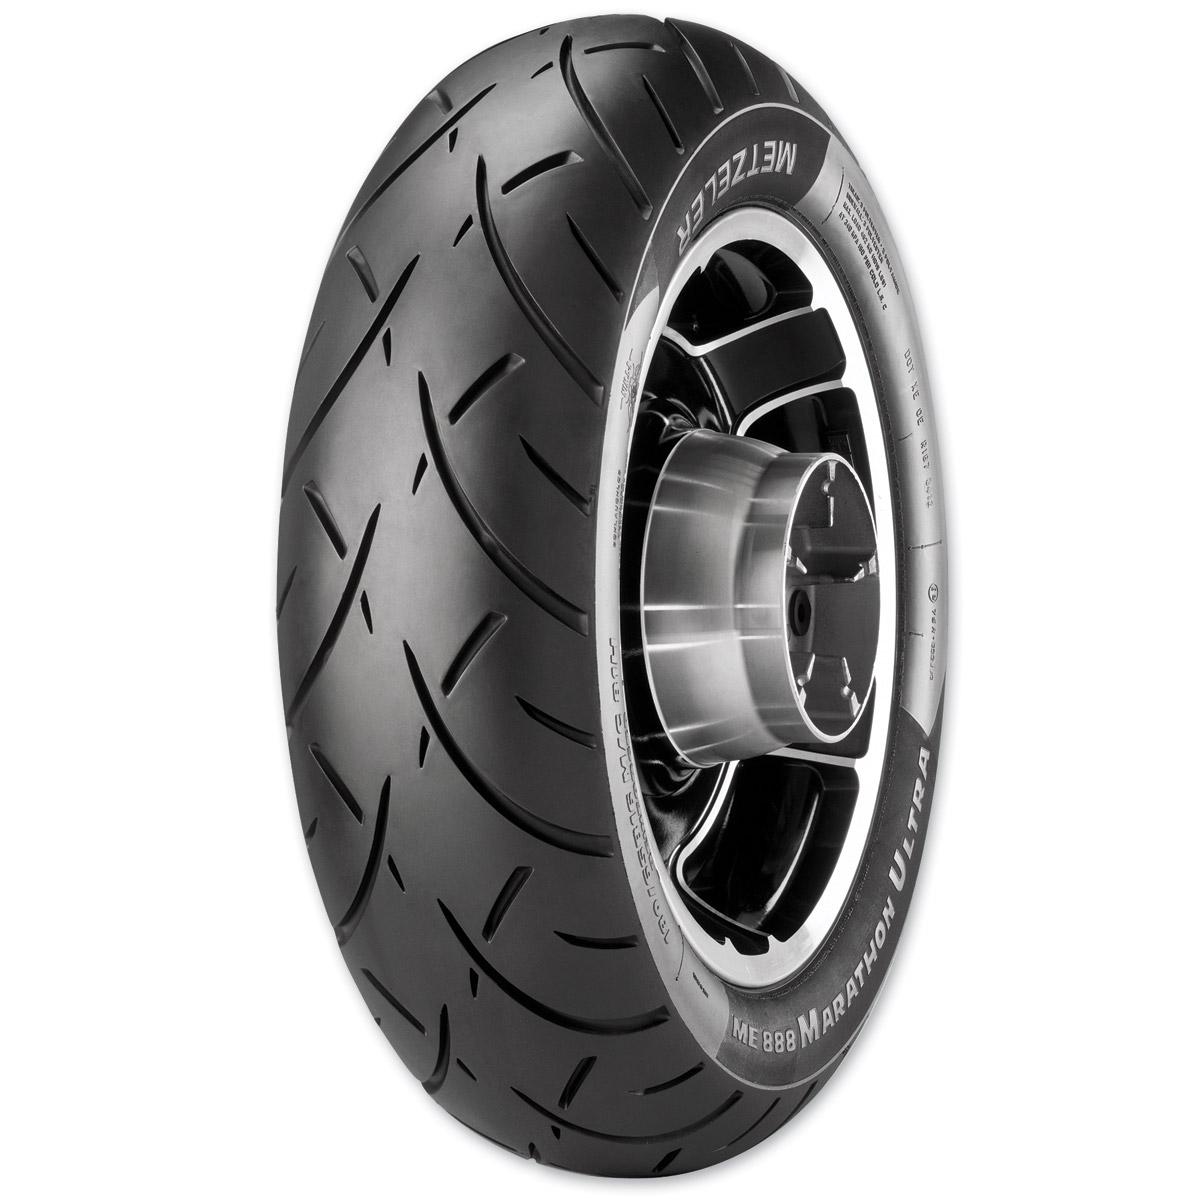 Metzeler ME888 Marathon Ultra 160/70B17 Rear Tire